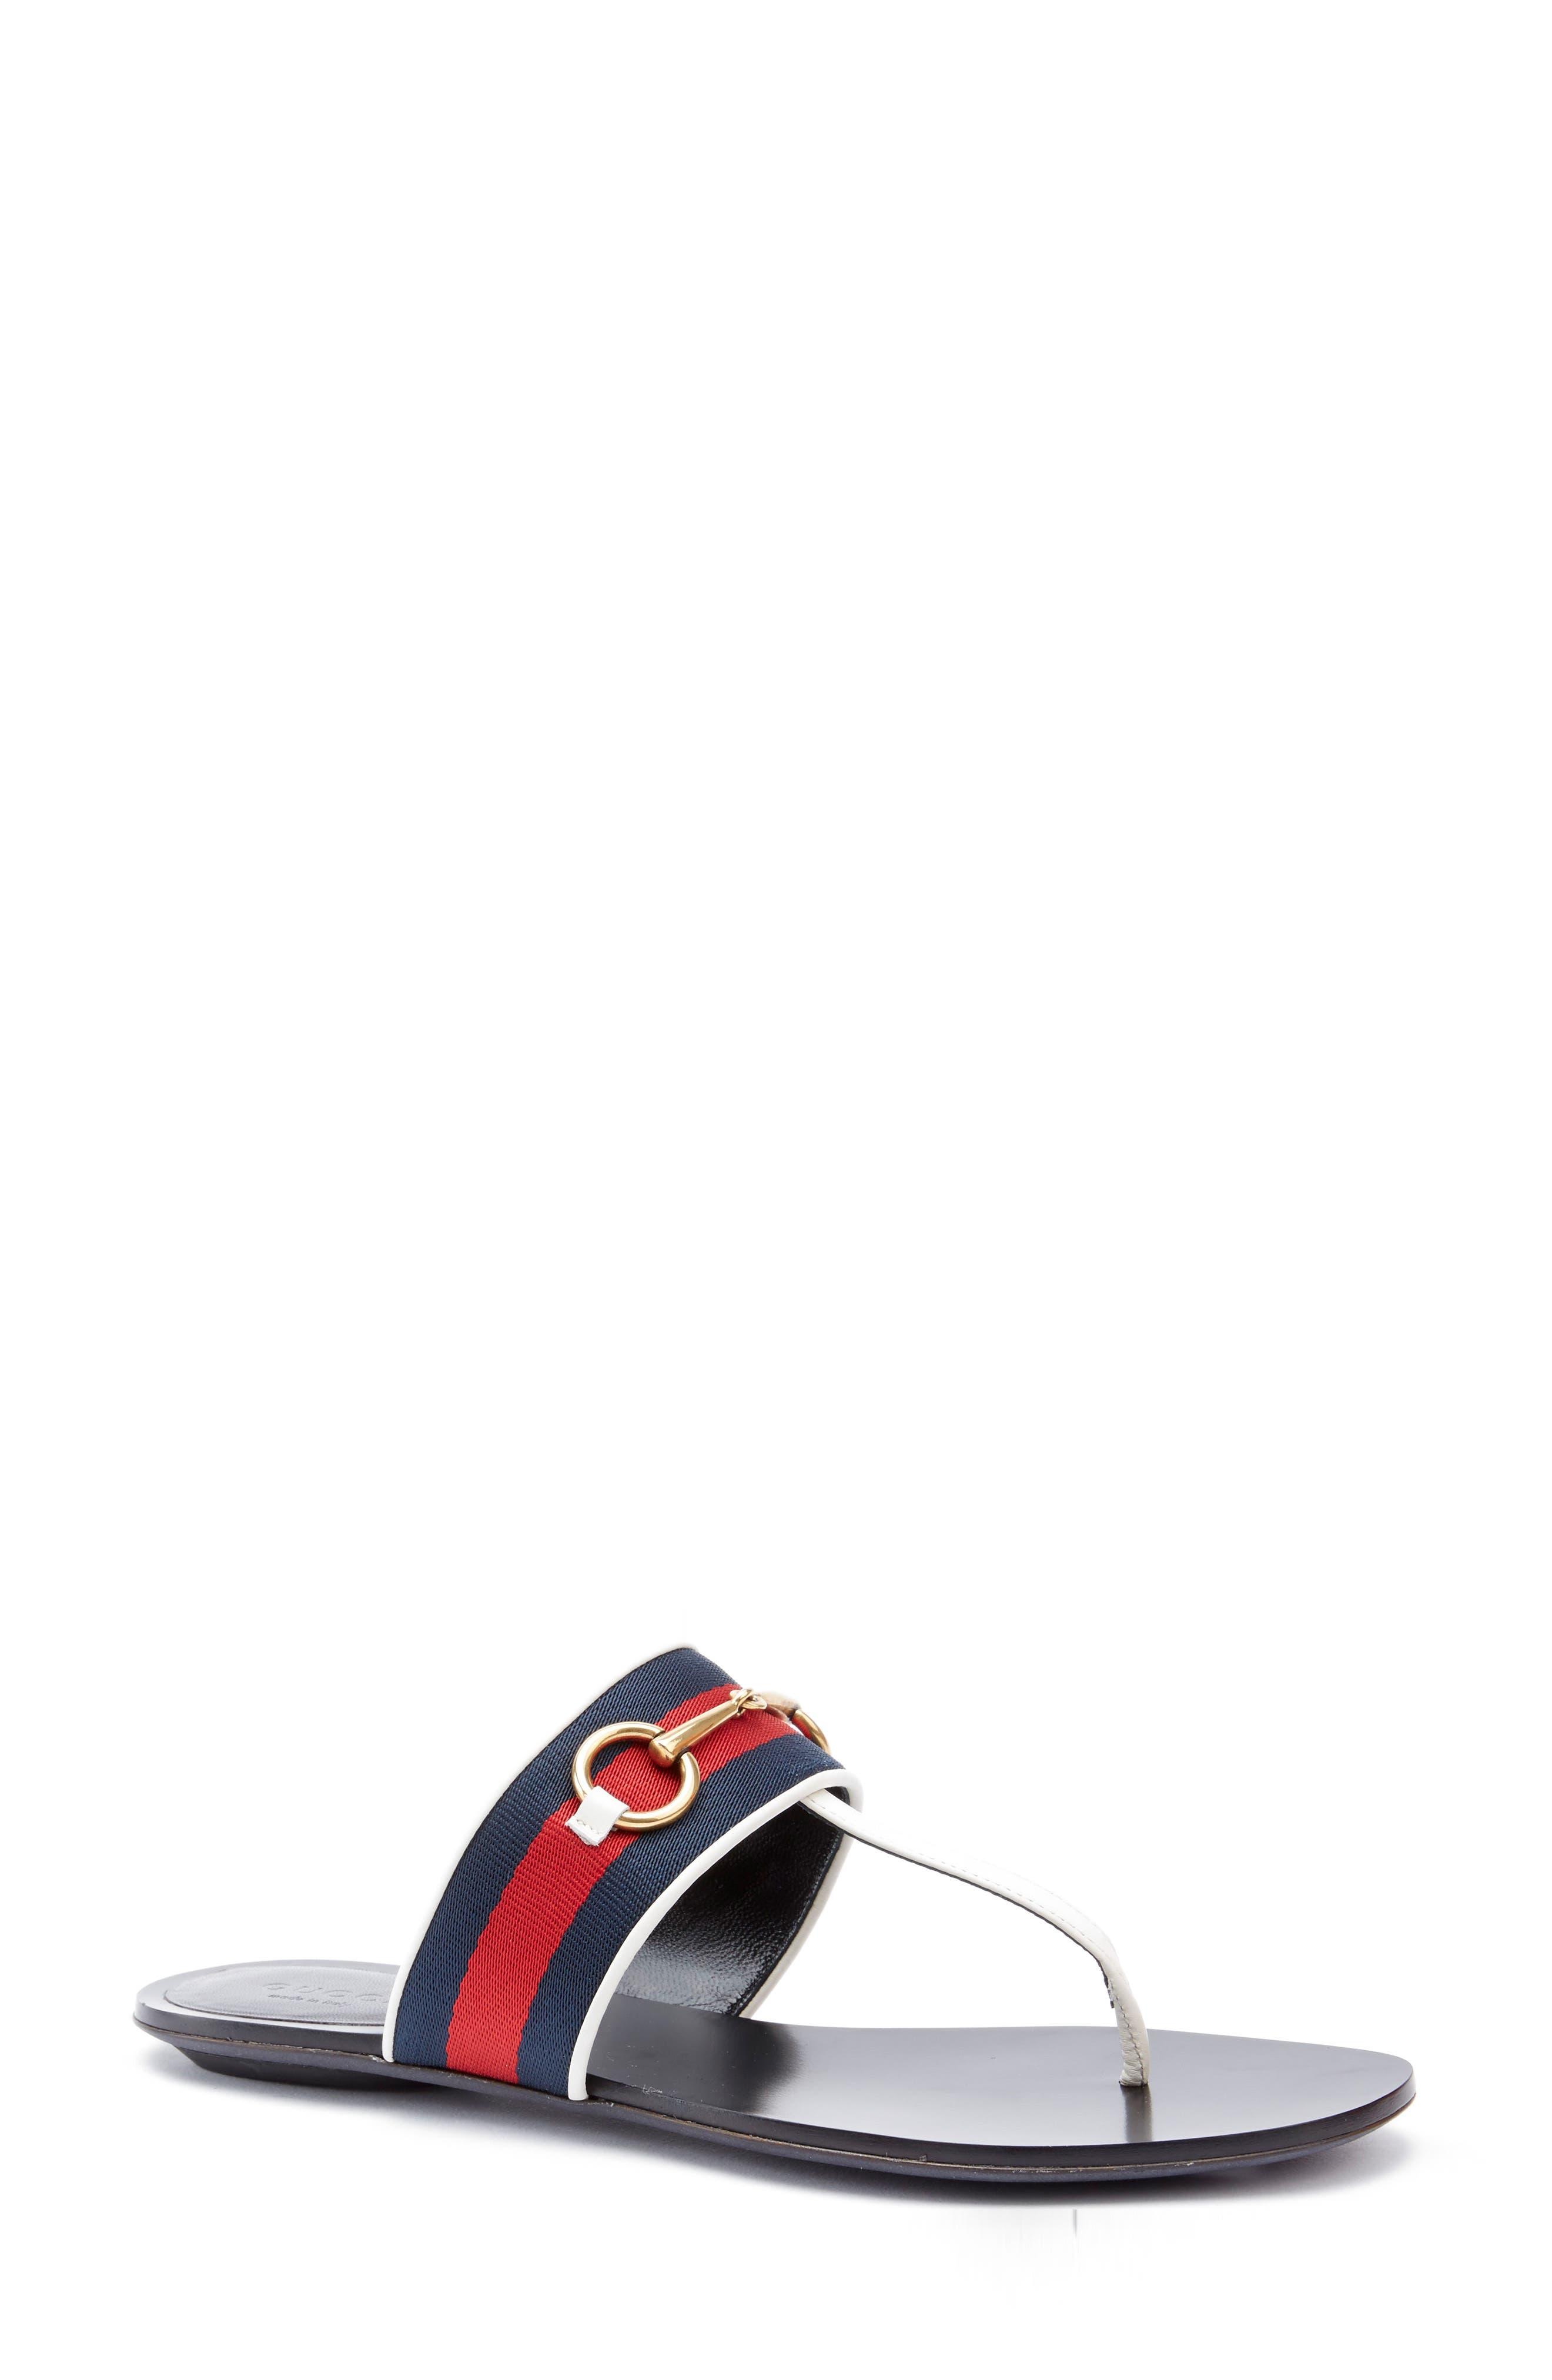 Alternate Image 1 Selected - Gucci Querelle Sandal (Women)